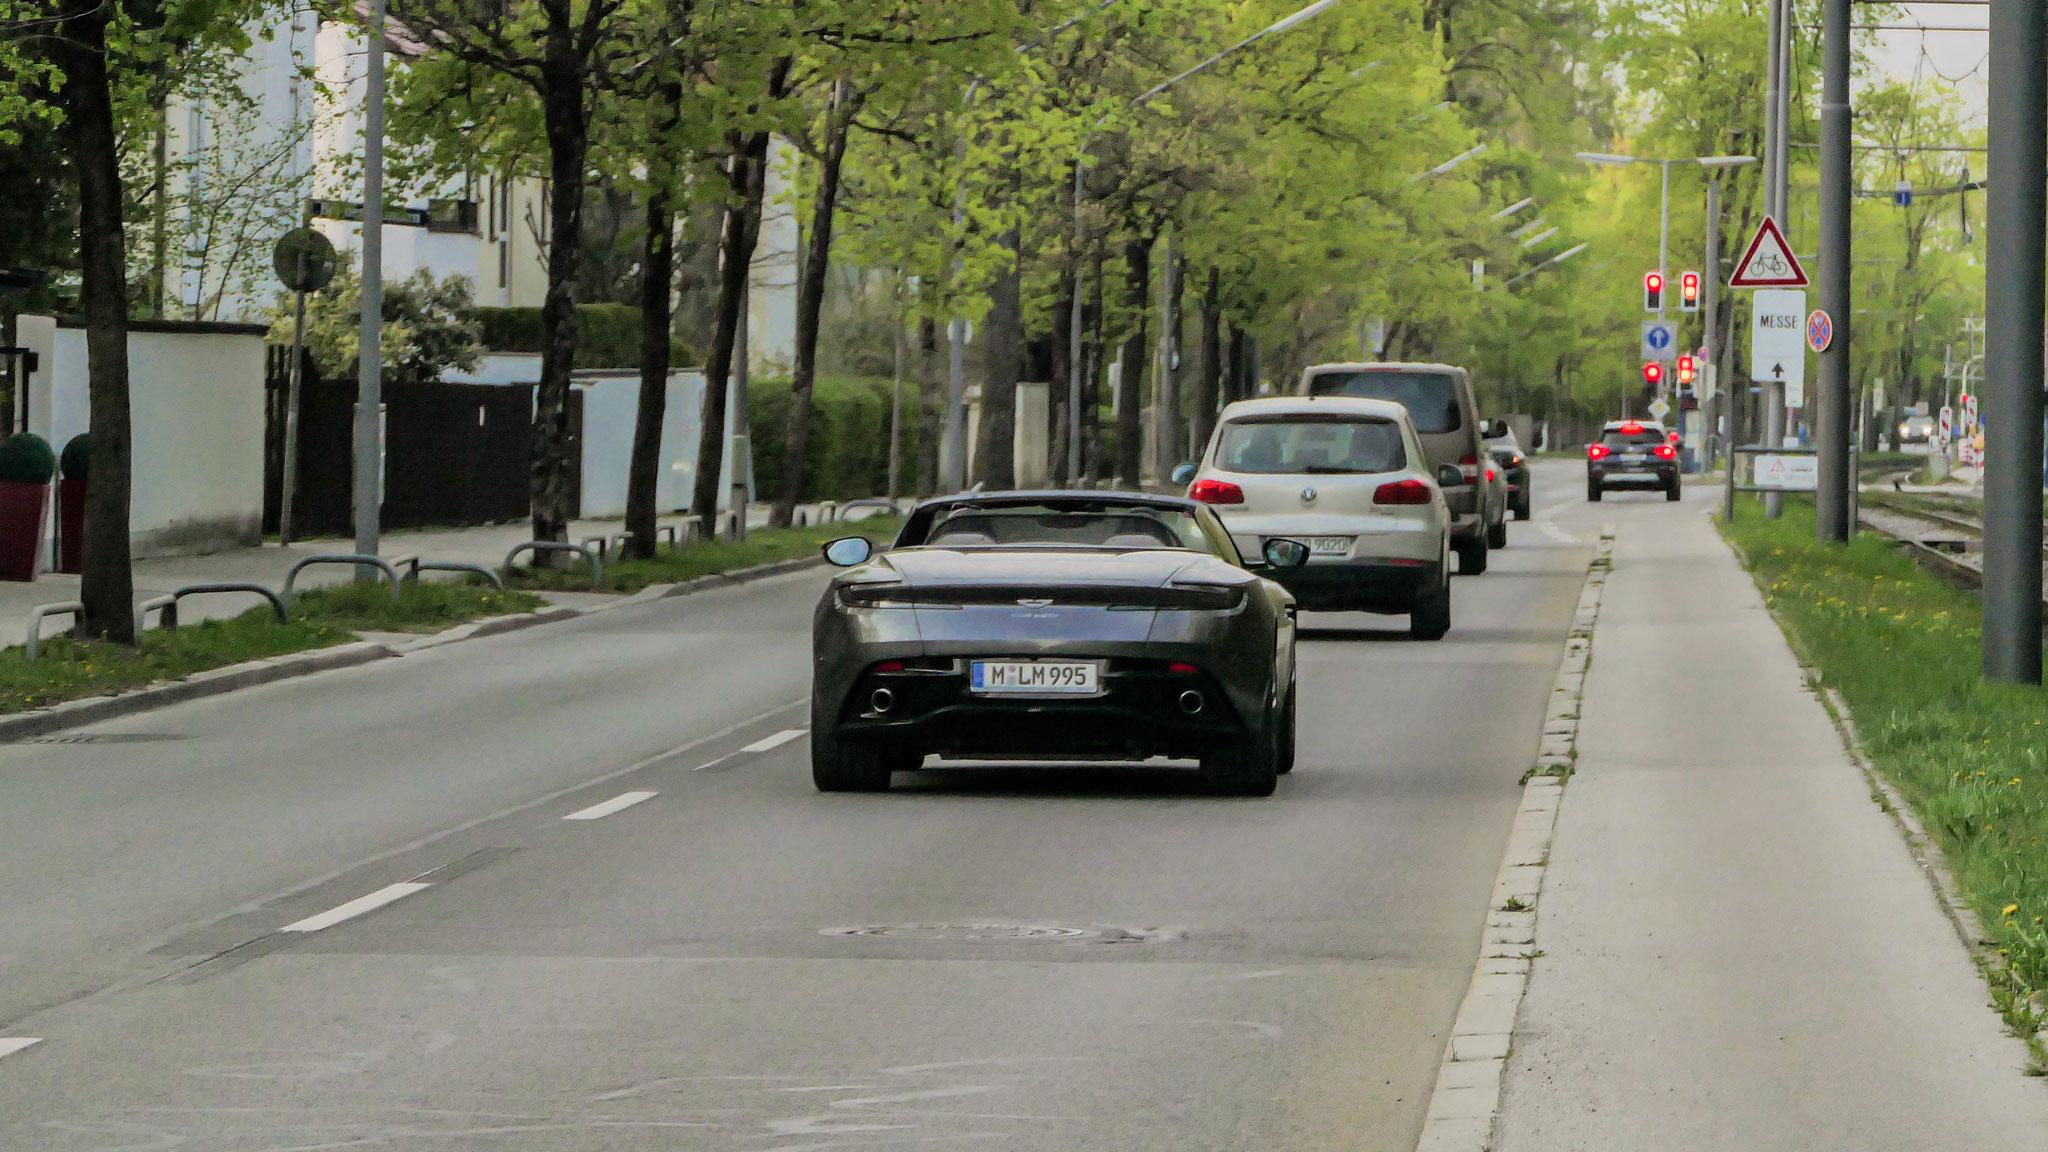 Aston Martin DB11 Volante - M-LM-995